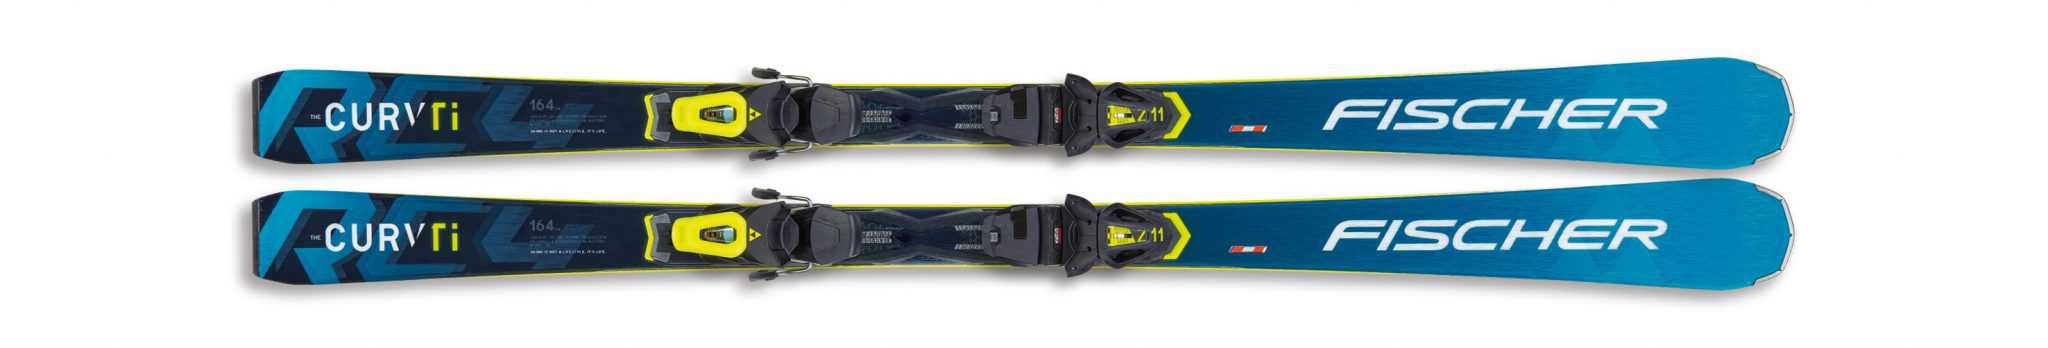 Fischer P15517 My Turn 73 SLR + W9: – E-Ski Alpin